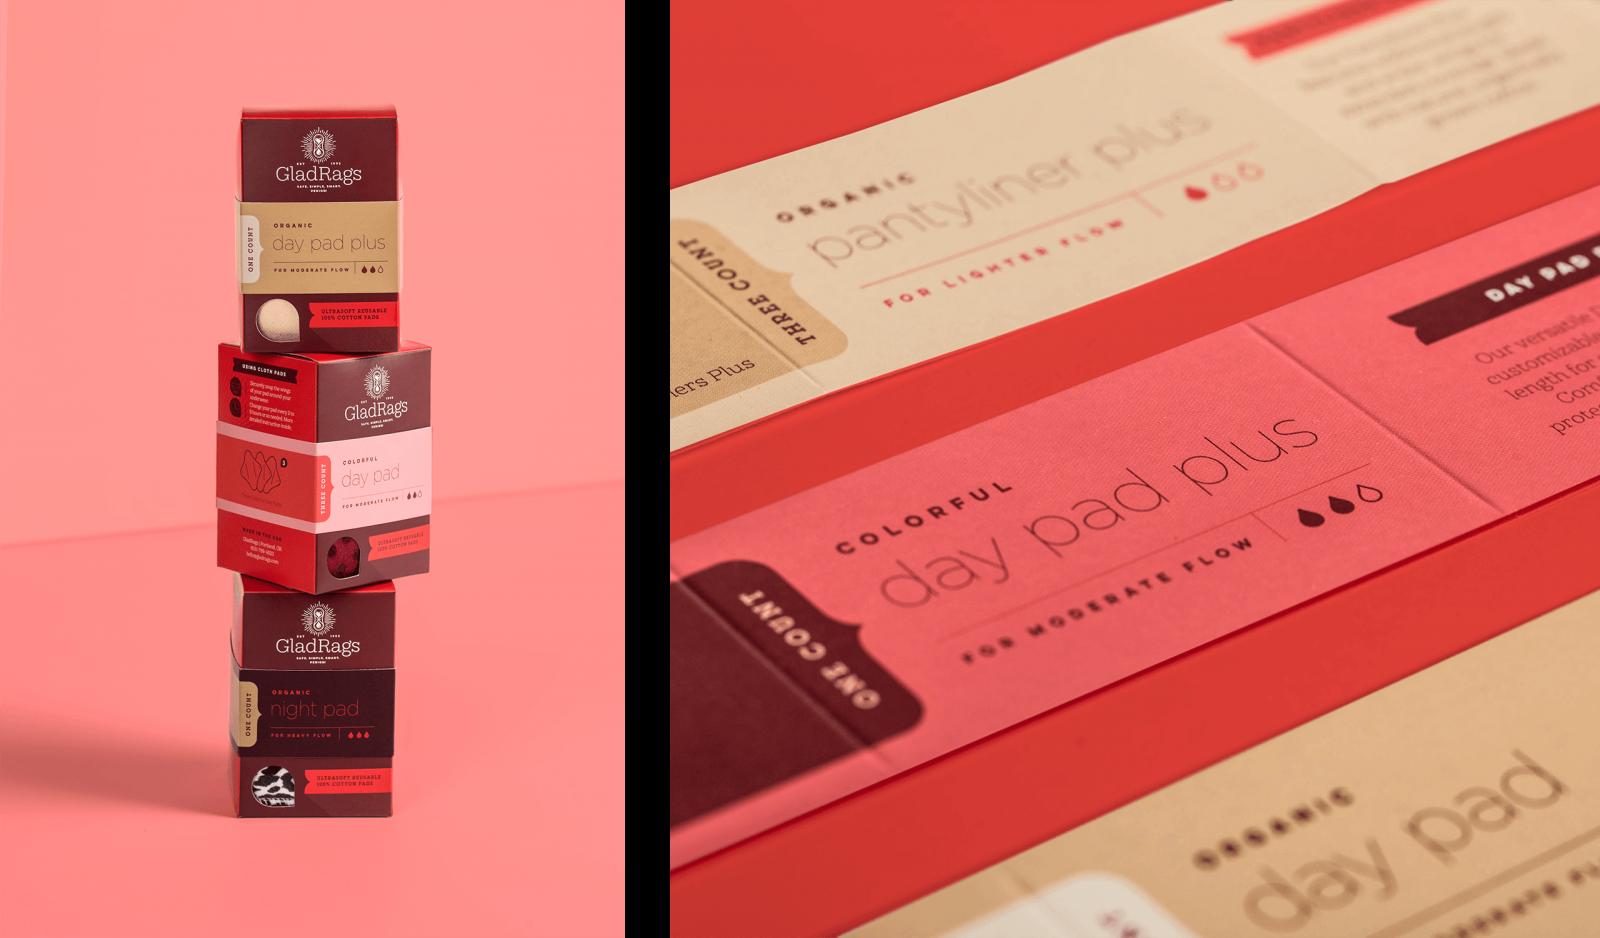 Glad Rags packaging design